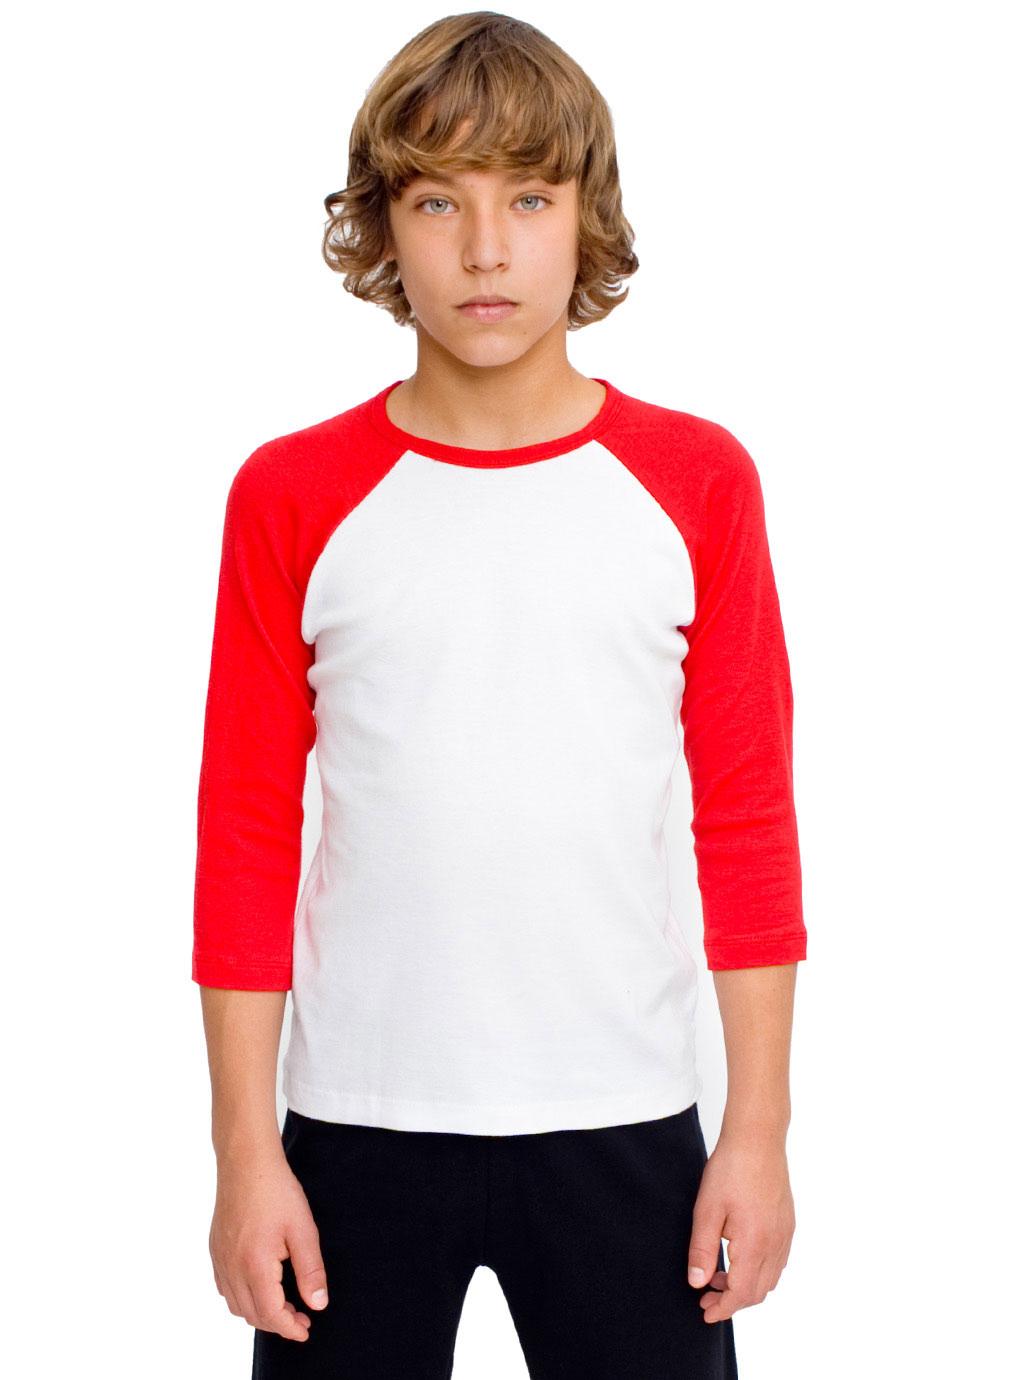 Kids baseball t shirts raglan baby boy girl 3 4 sleeve Boy white t shirt